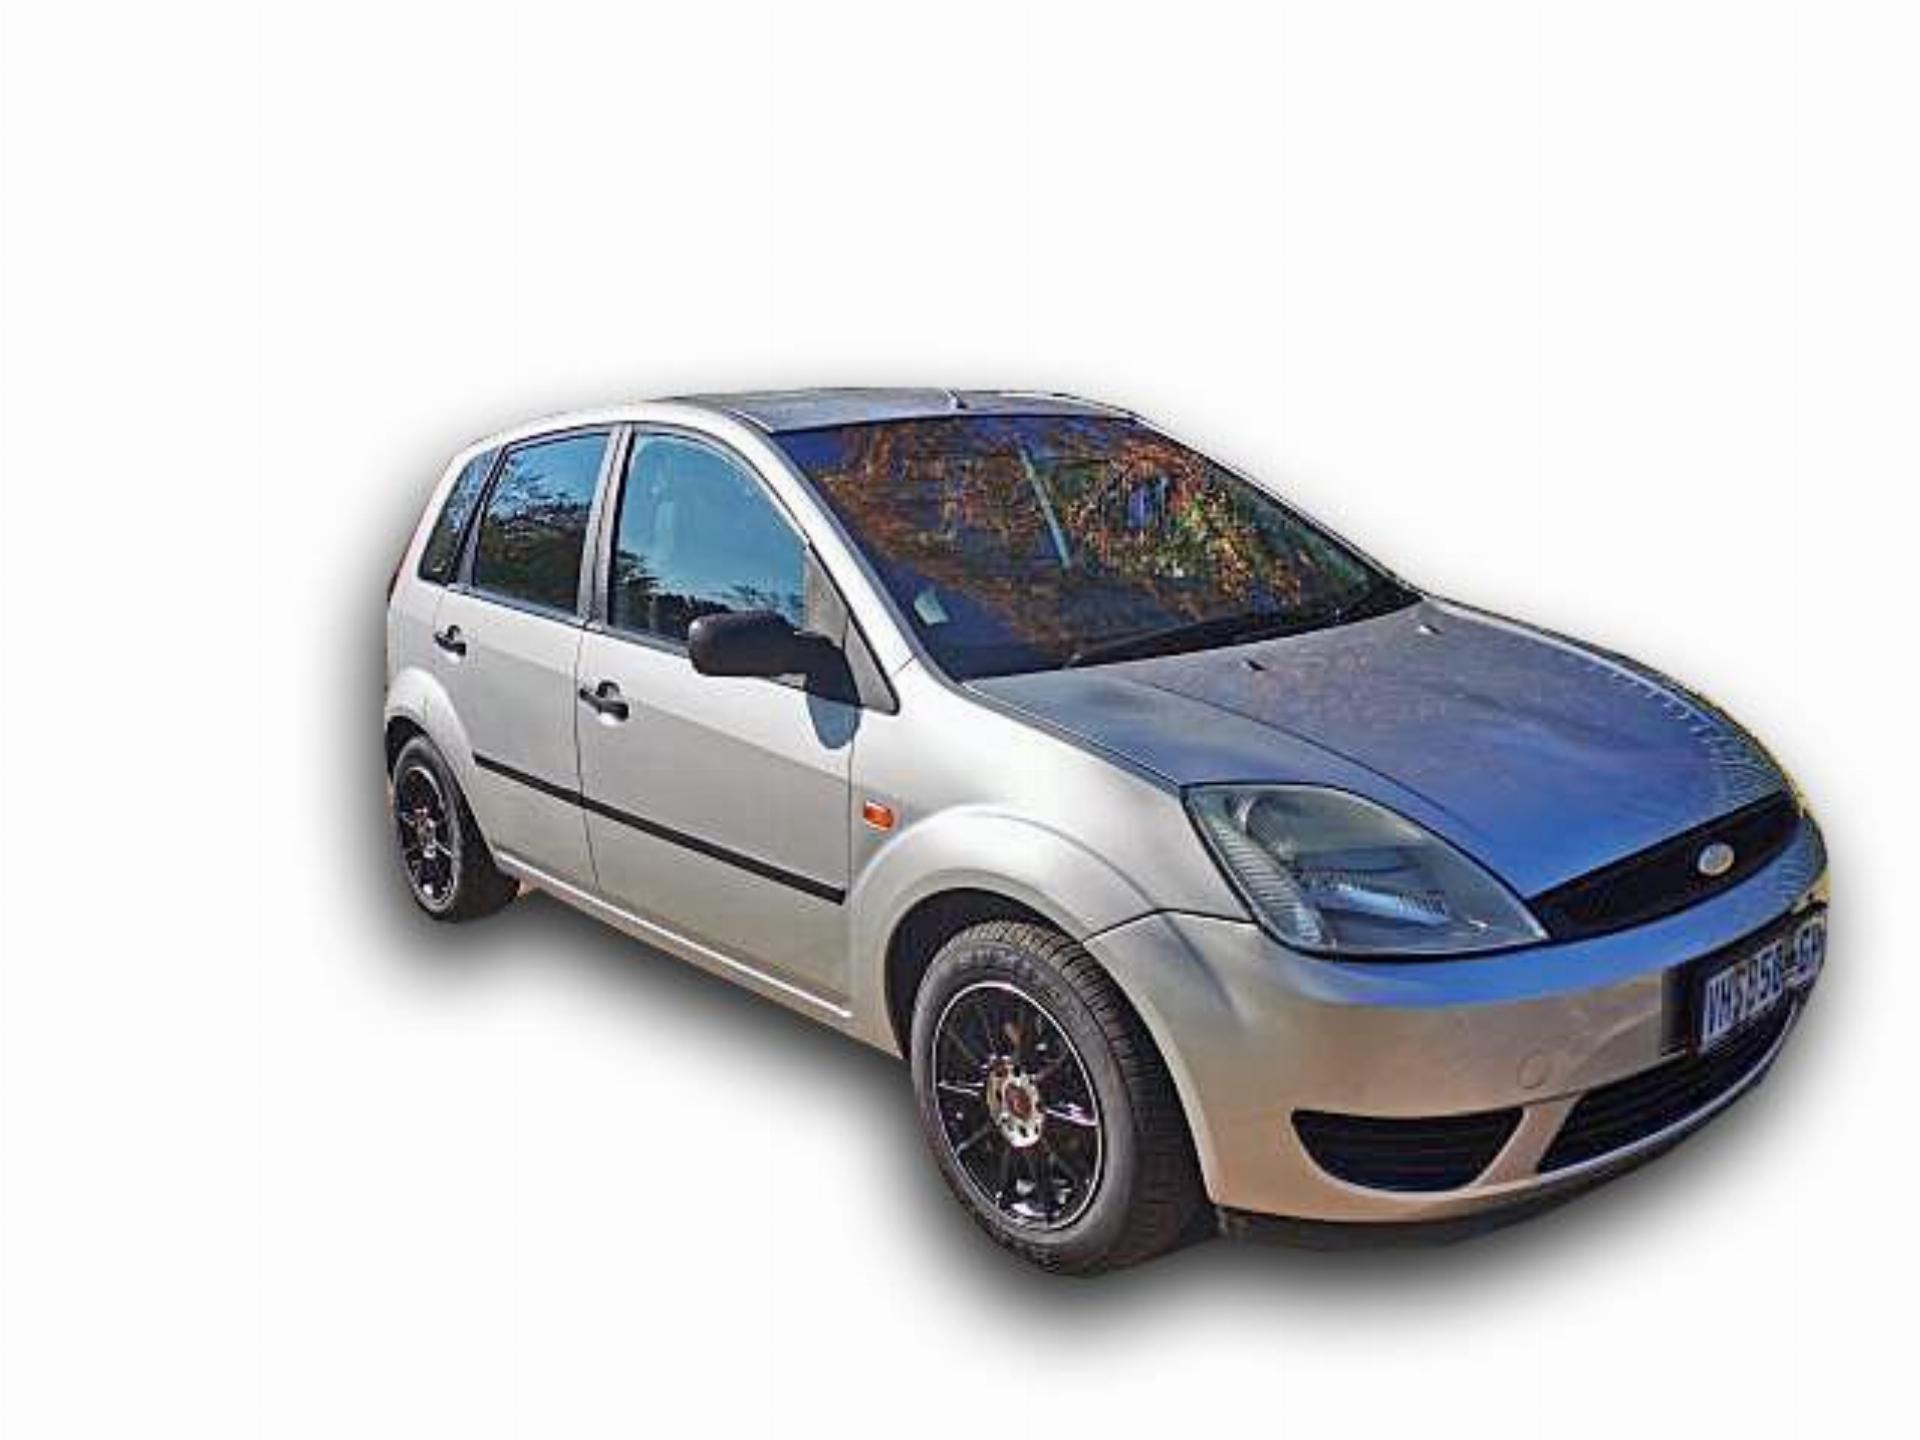 Ford Fiesta 1.4I 5DR